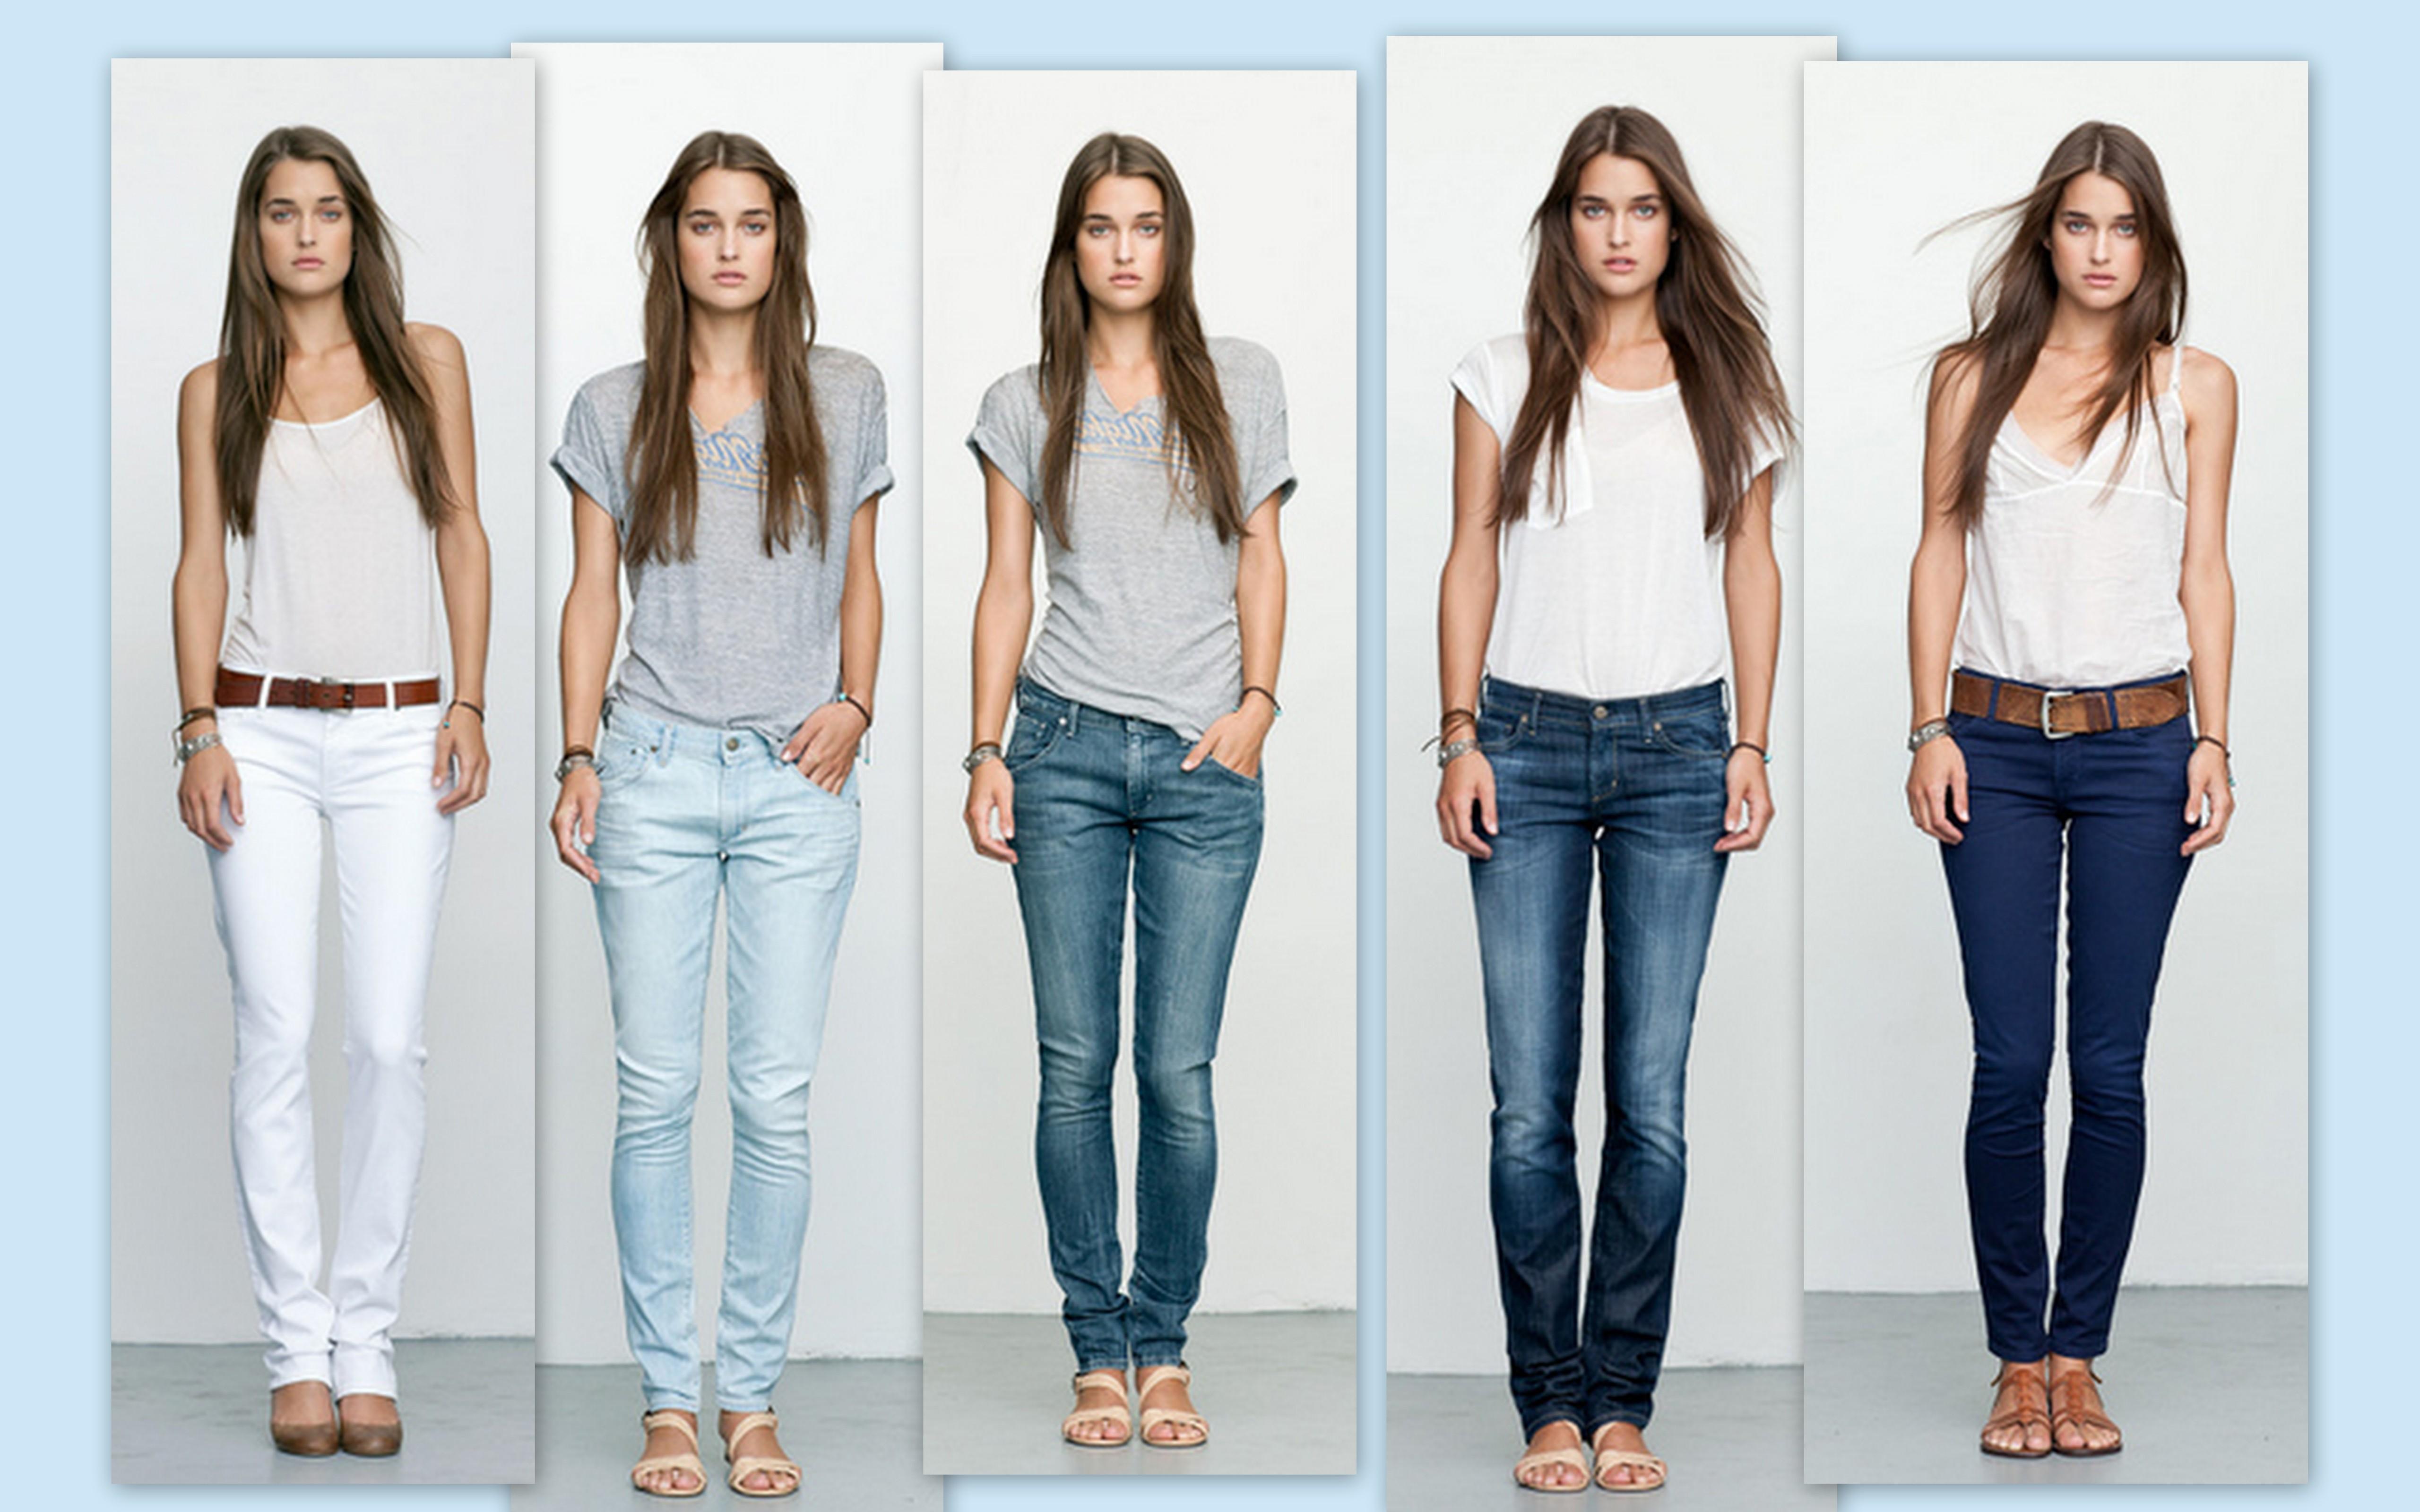 fashion jeans jeans fashion 20157poster.jpg kkdcpup